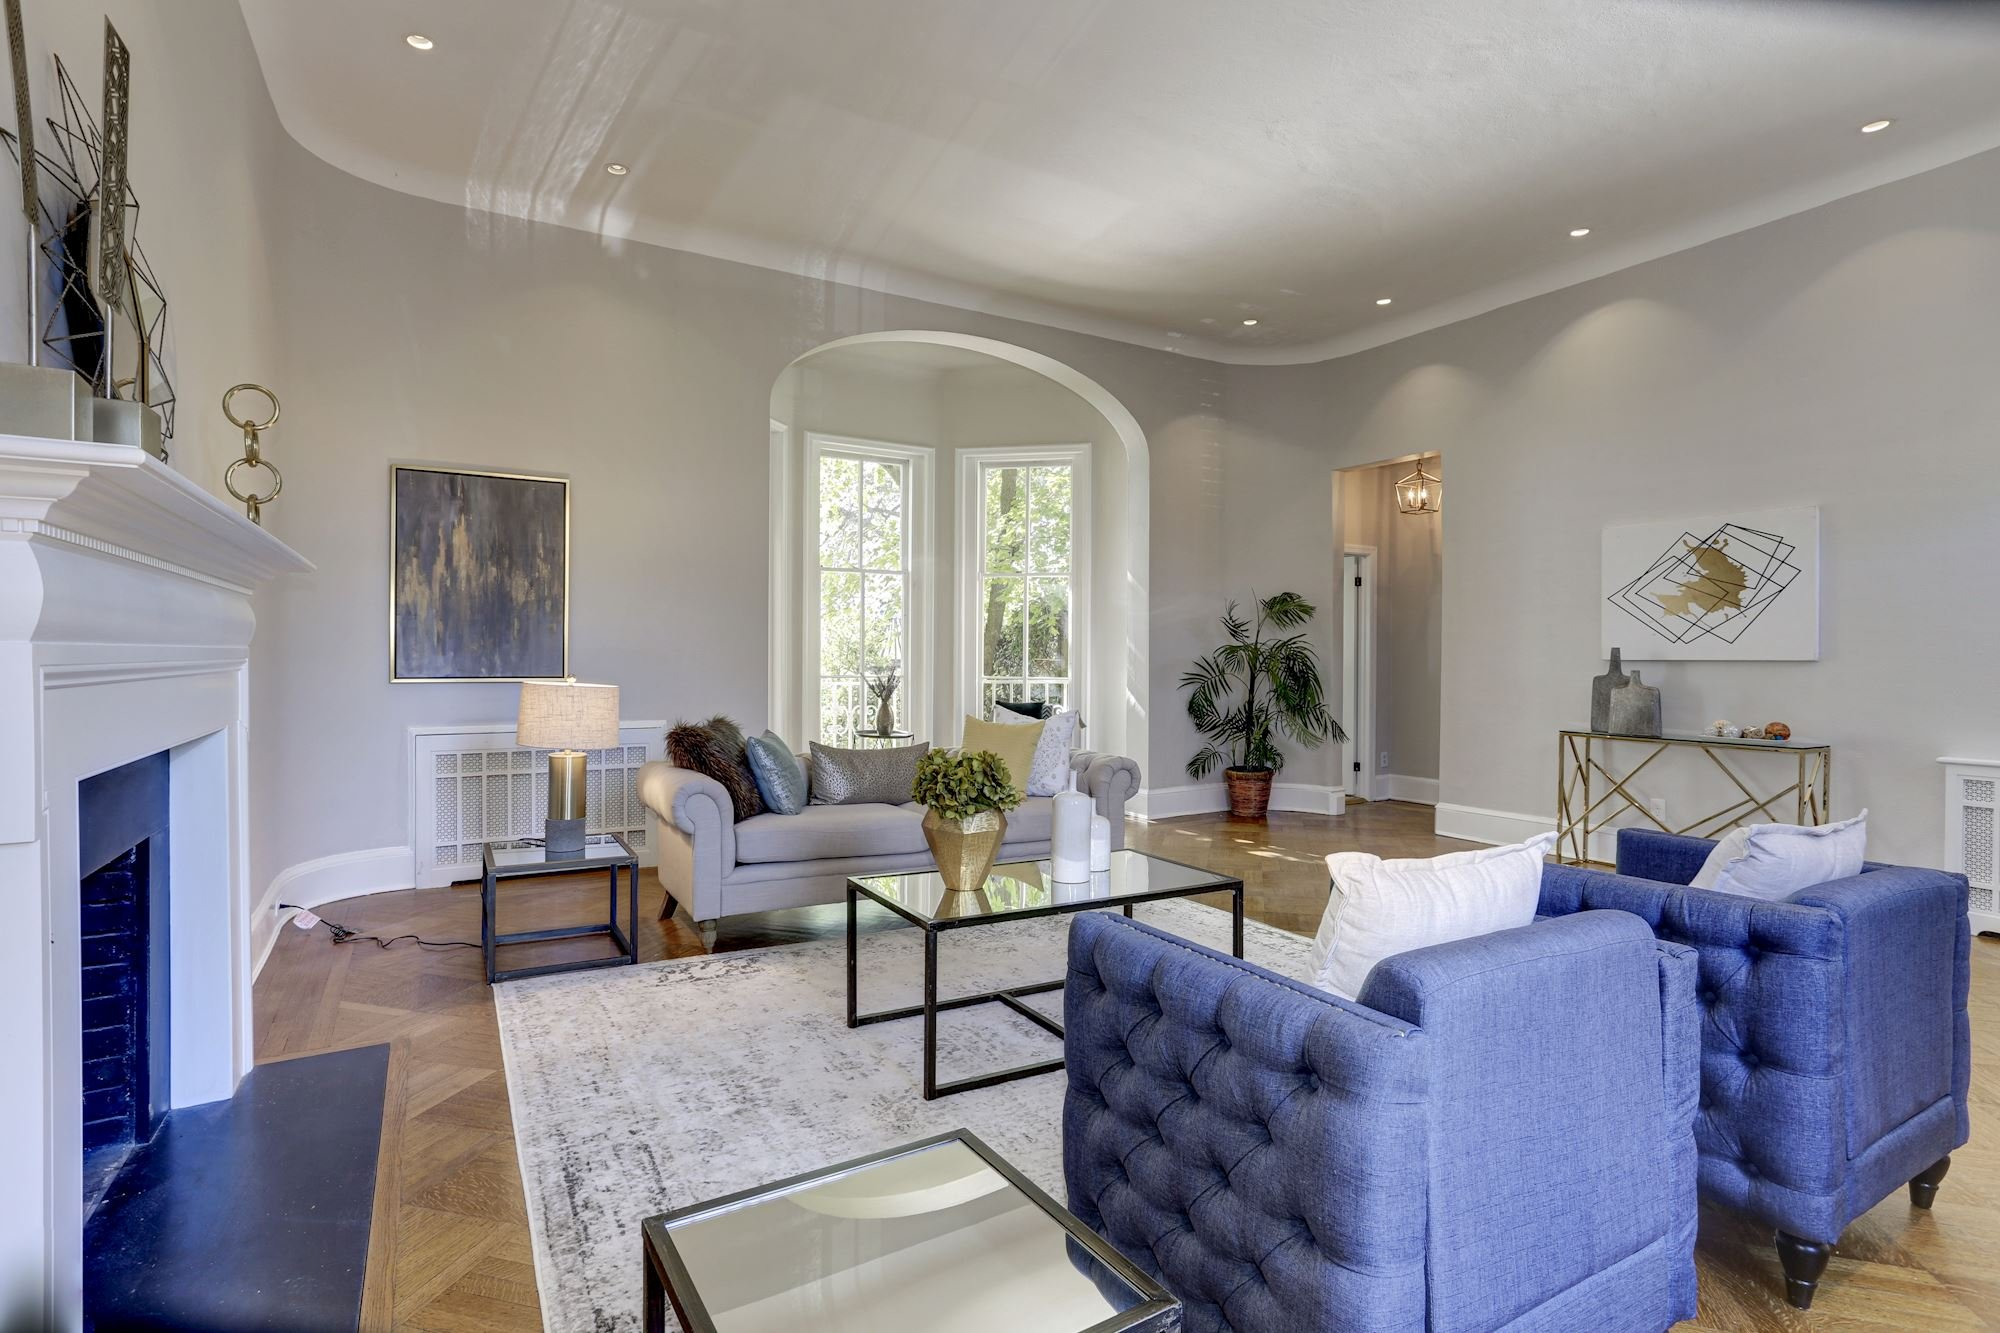 The Hope Diamond Was Once Kept Inside This Georgetown House - Washingtonian